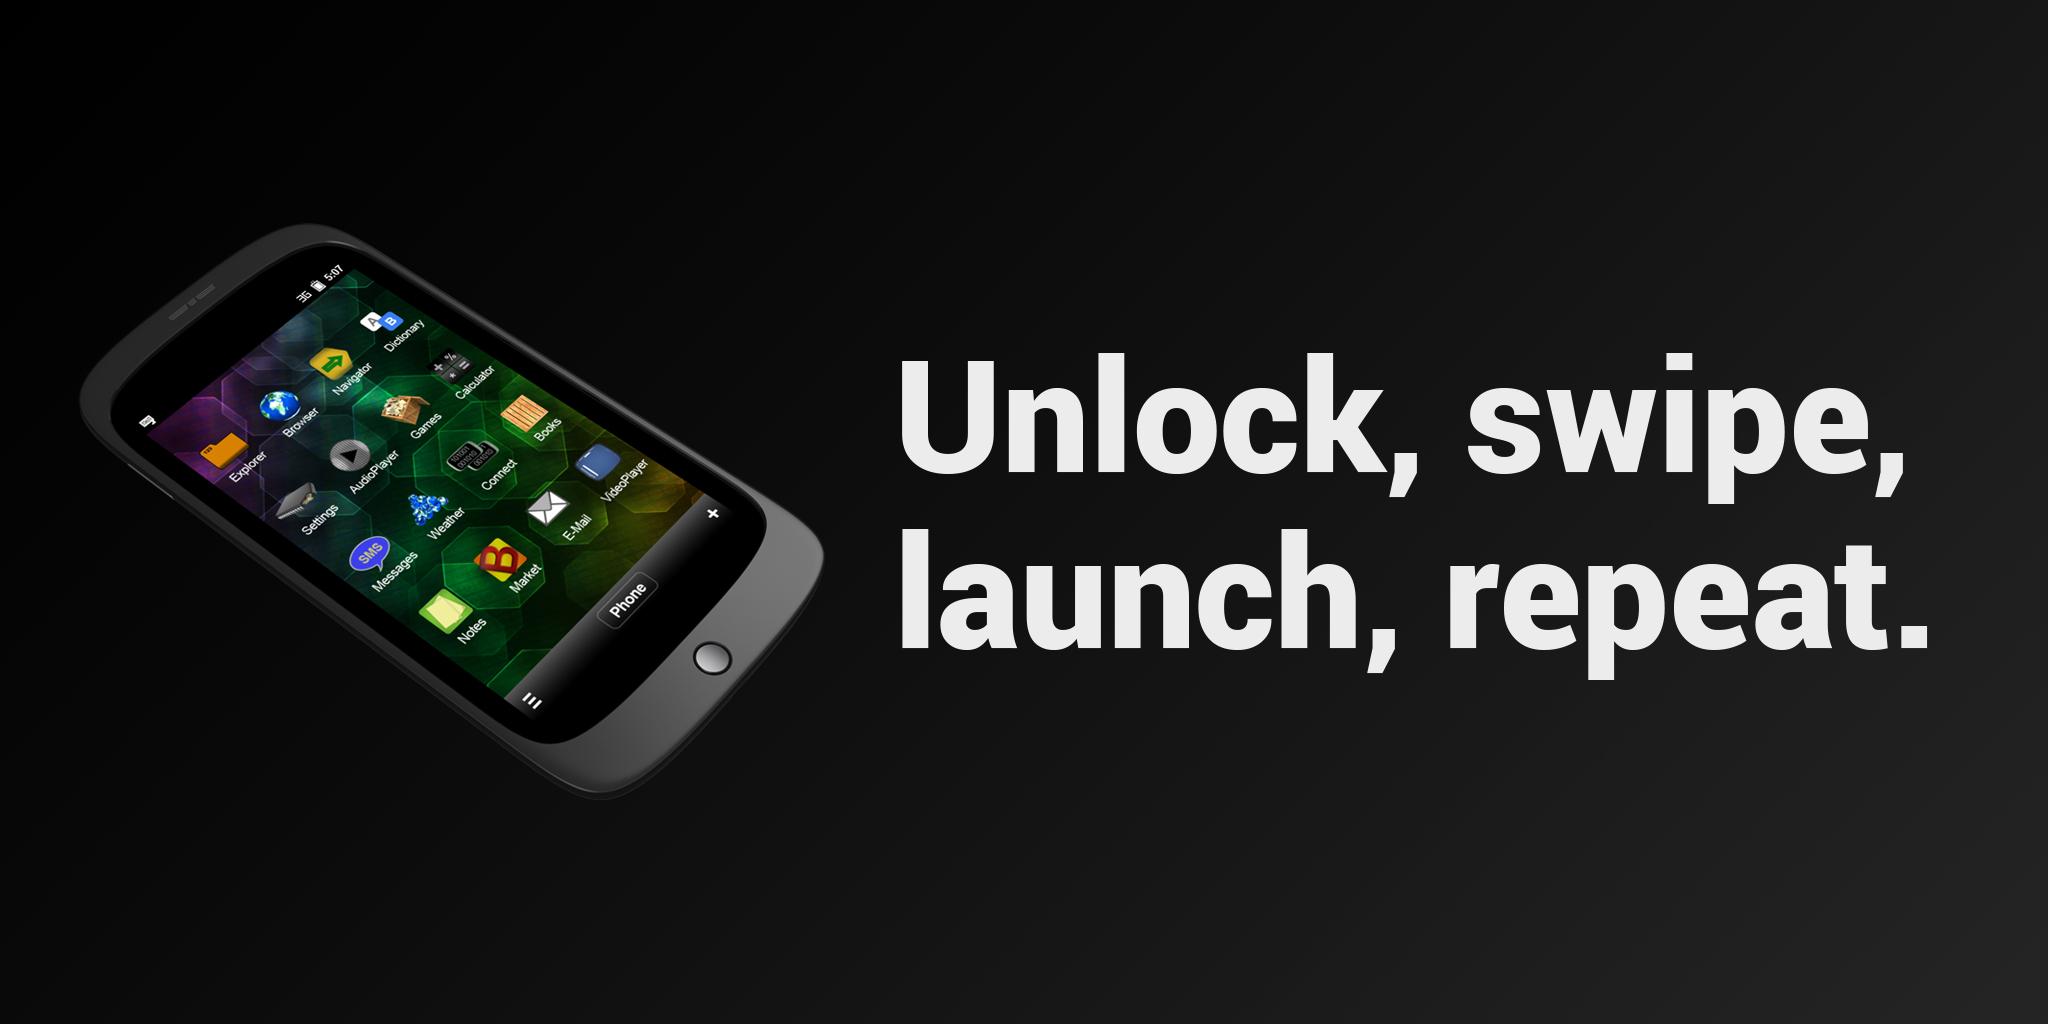 Smartphone: Unlock, swipe, launch, repeat.